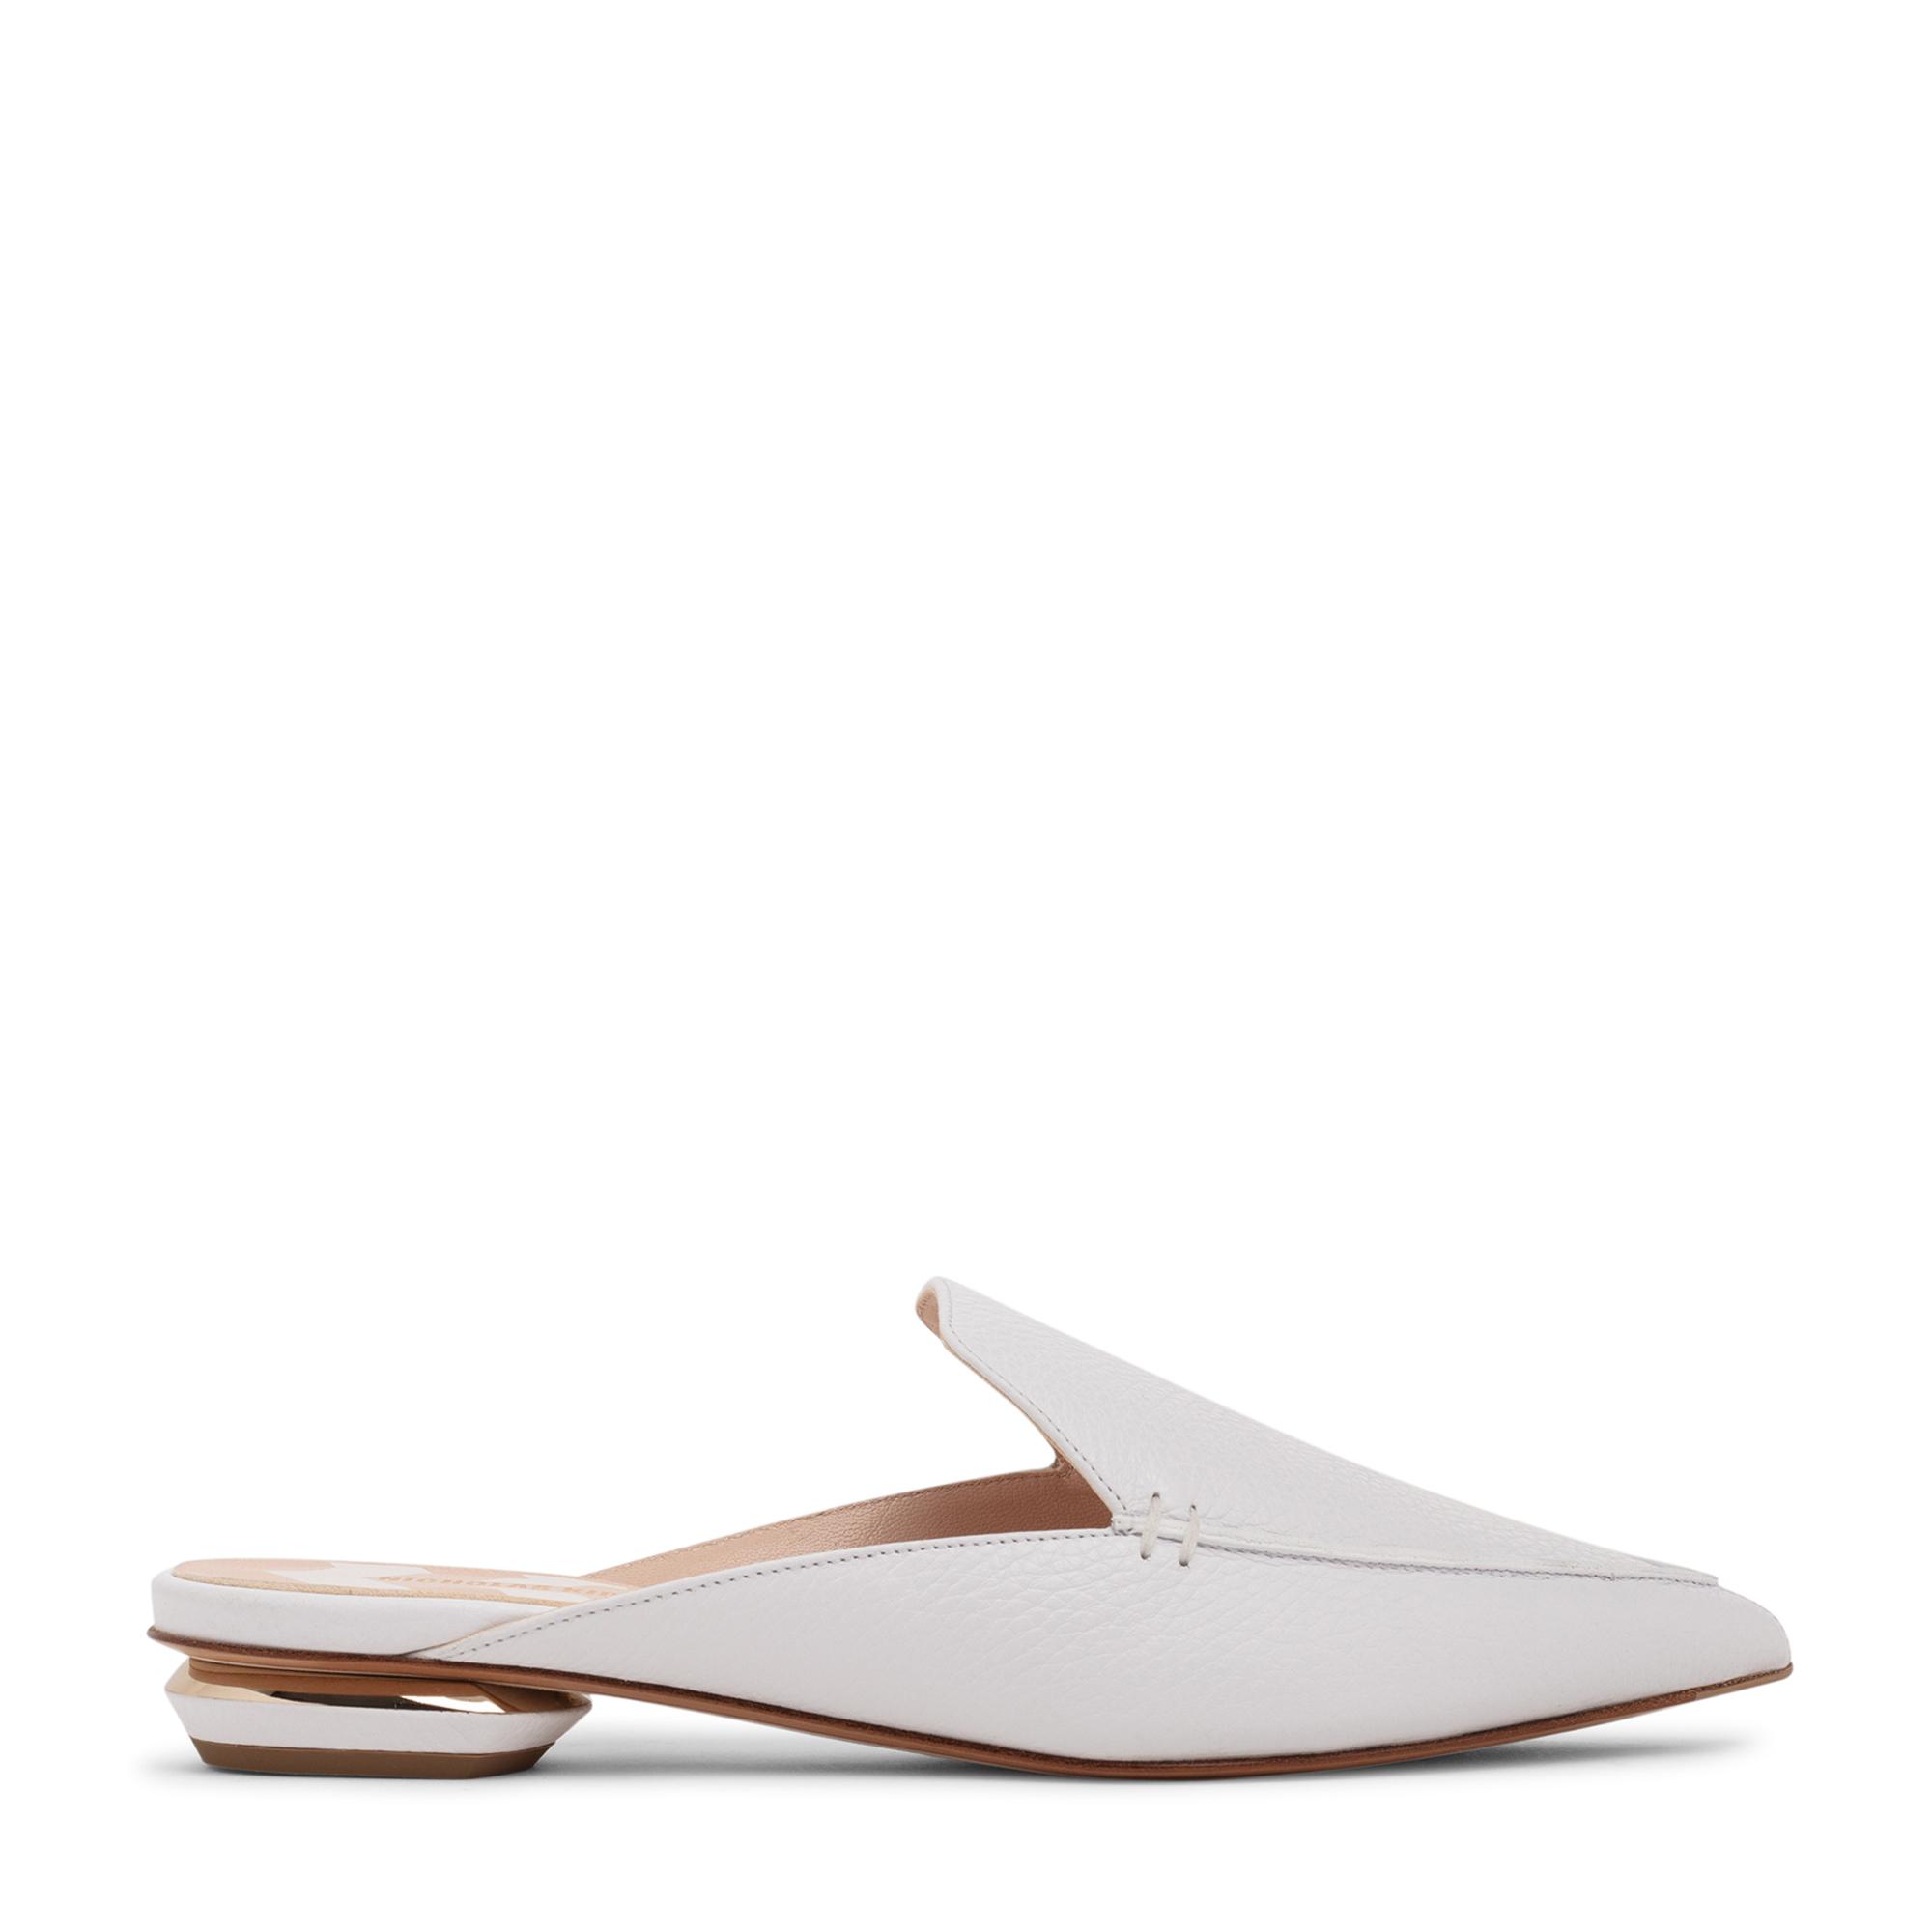 Beya leather flat mules